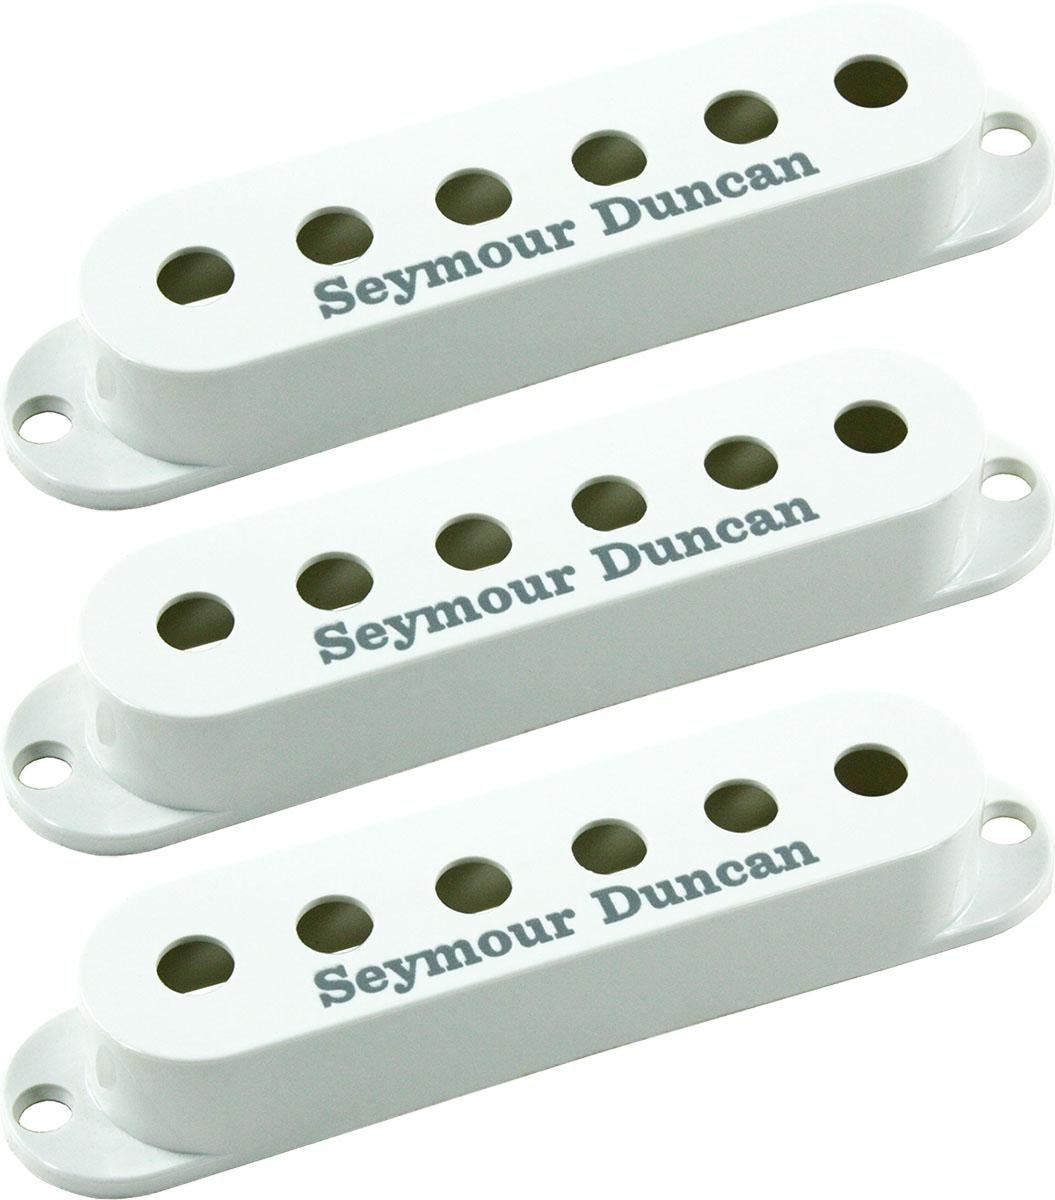 set of 3 seymour duncan strat single coil pickup covers white w logo new 800315010714 ebay. Black Bedroom Furniture Sets. Home Design Ideas